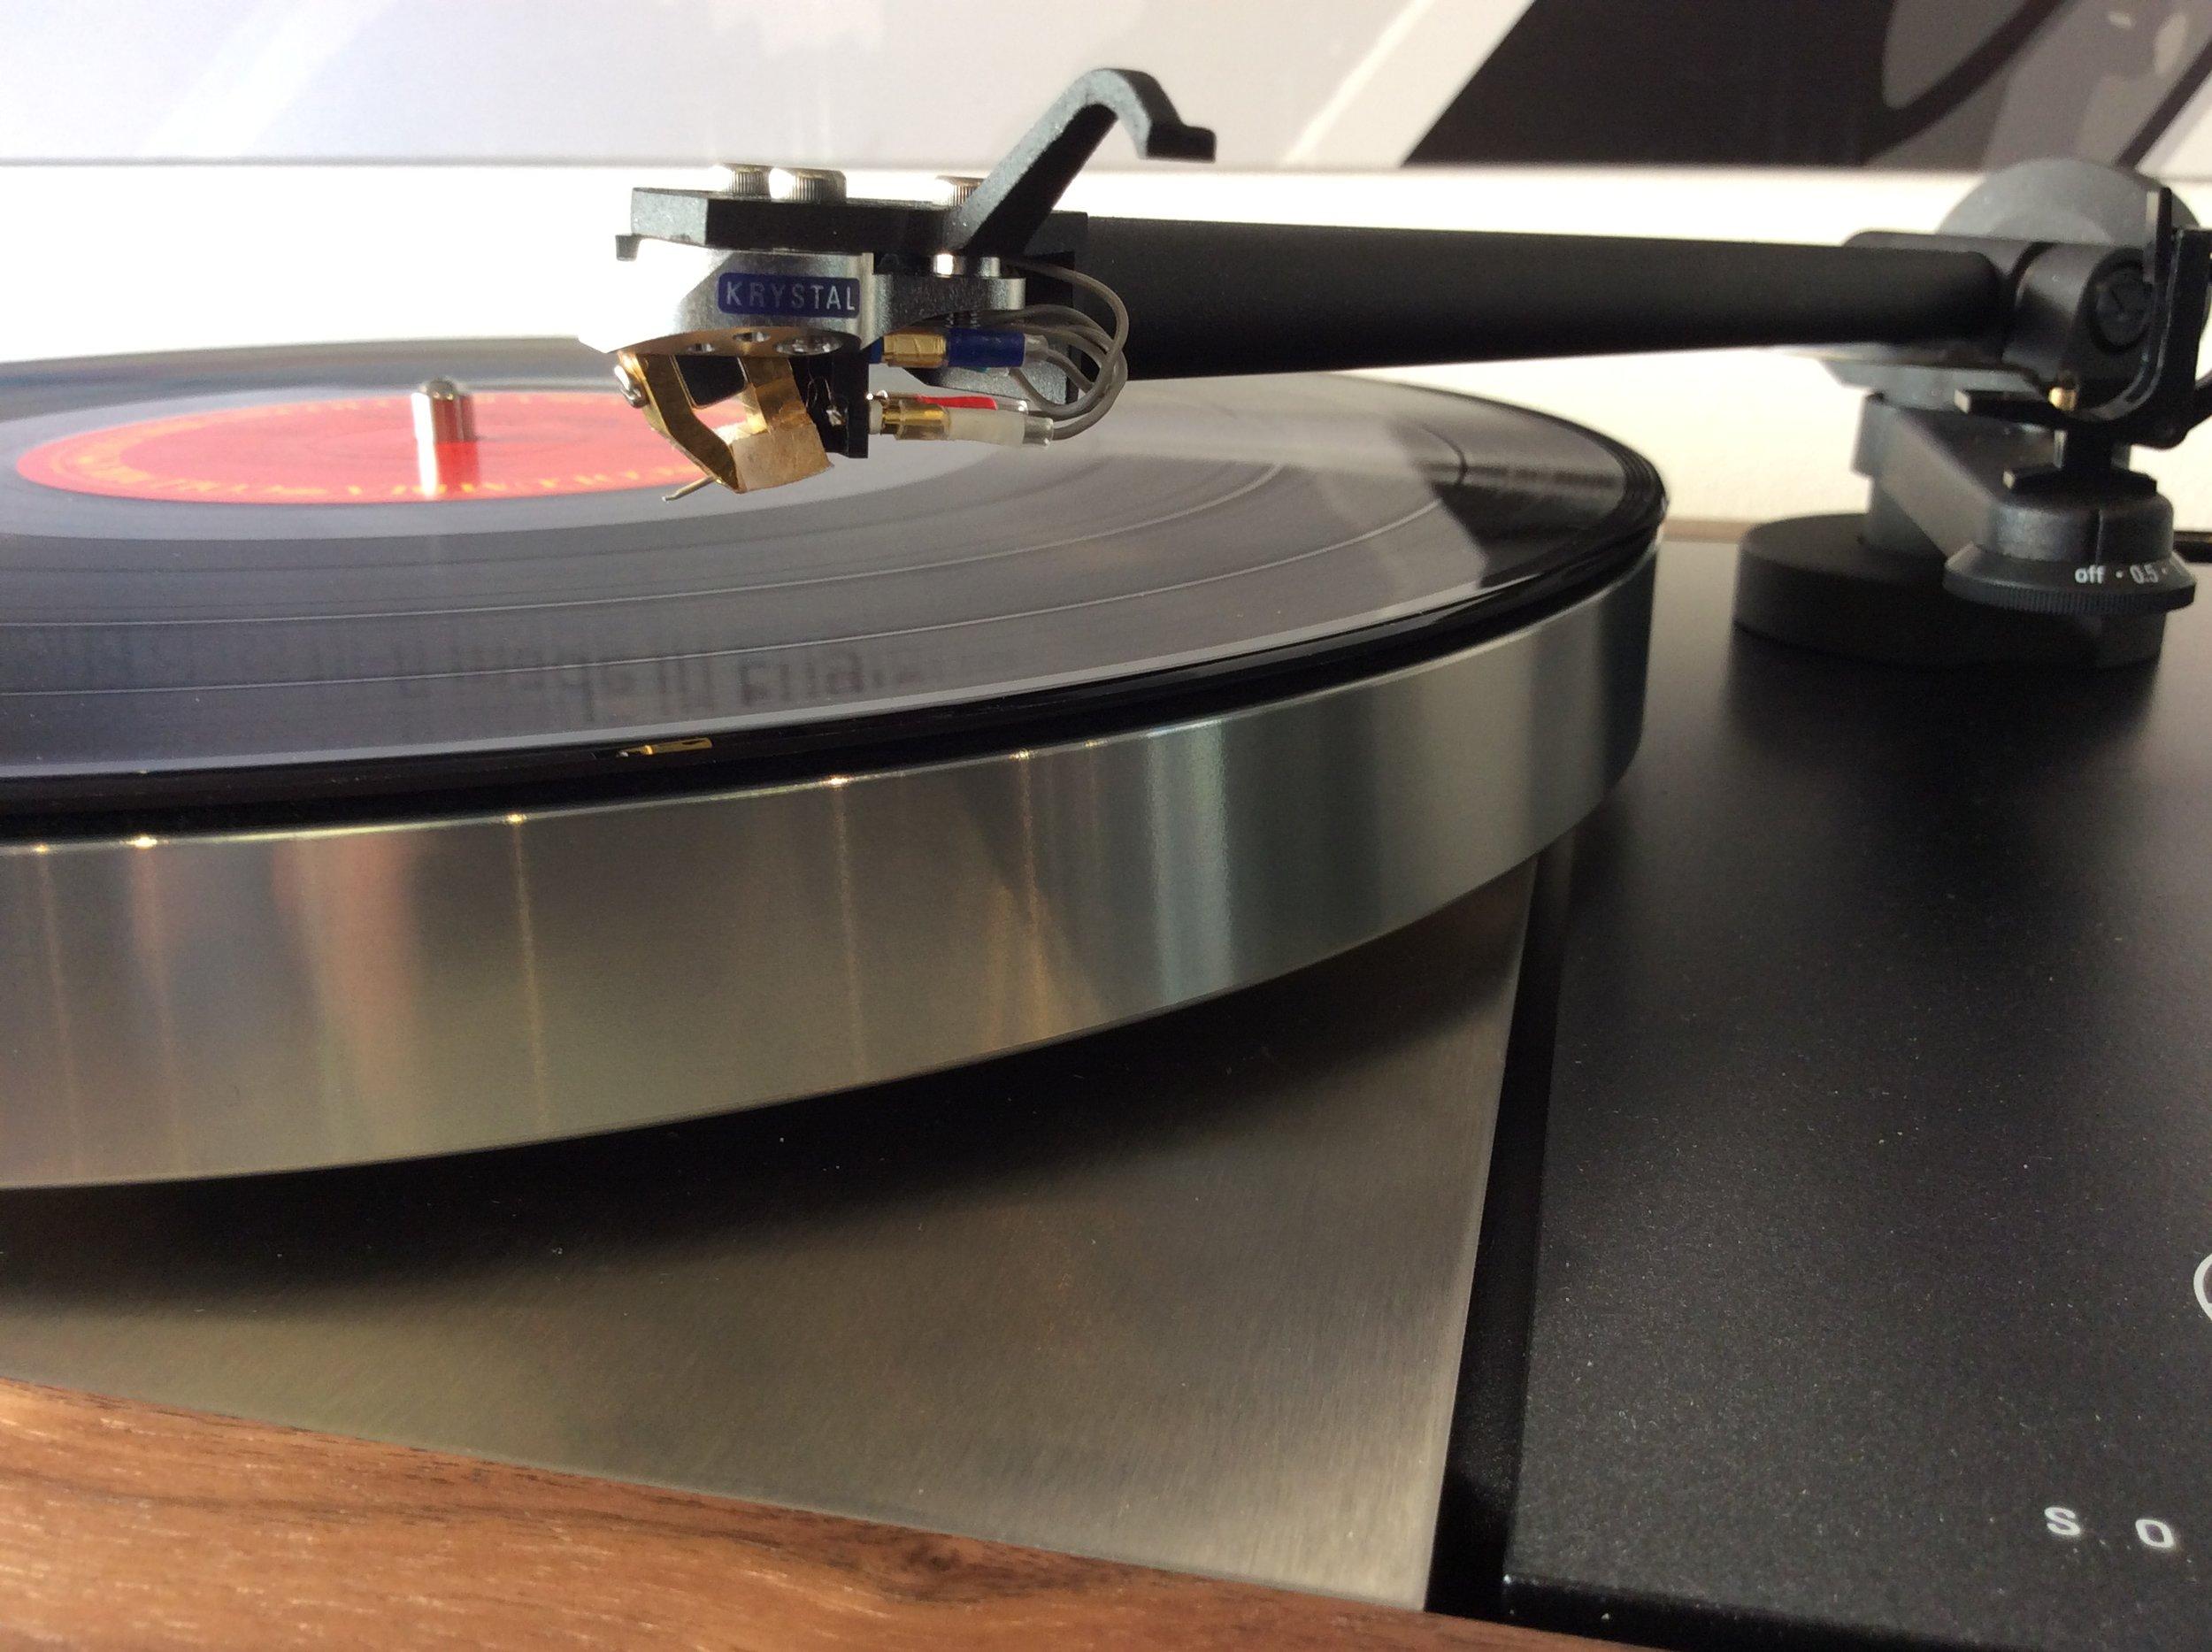 Linn Krystal Moving-Coil Cartridge